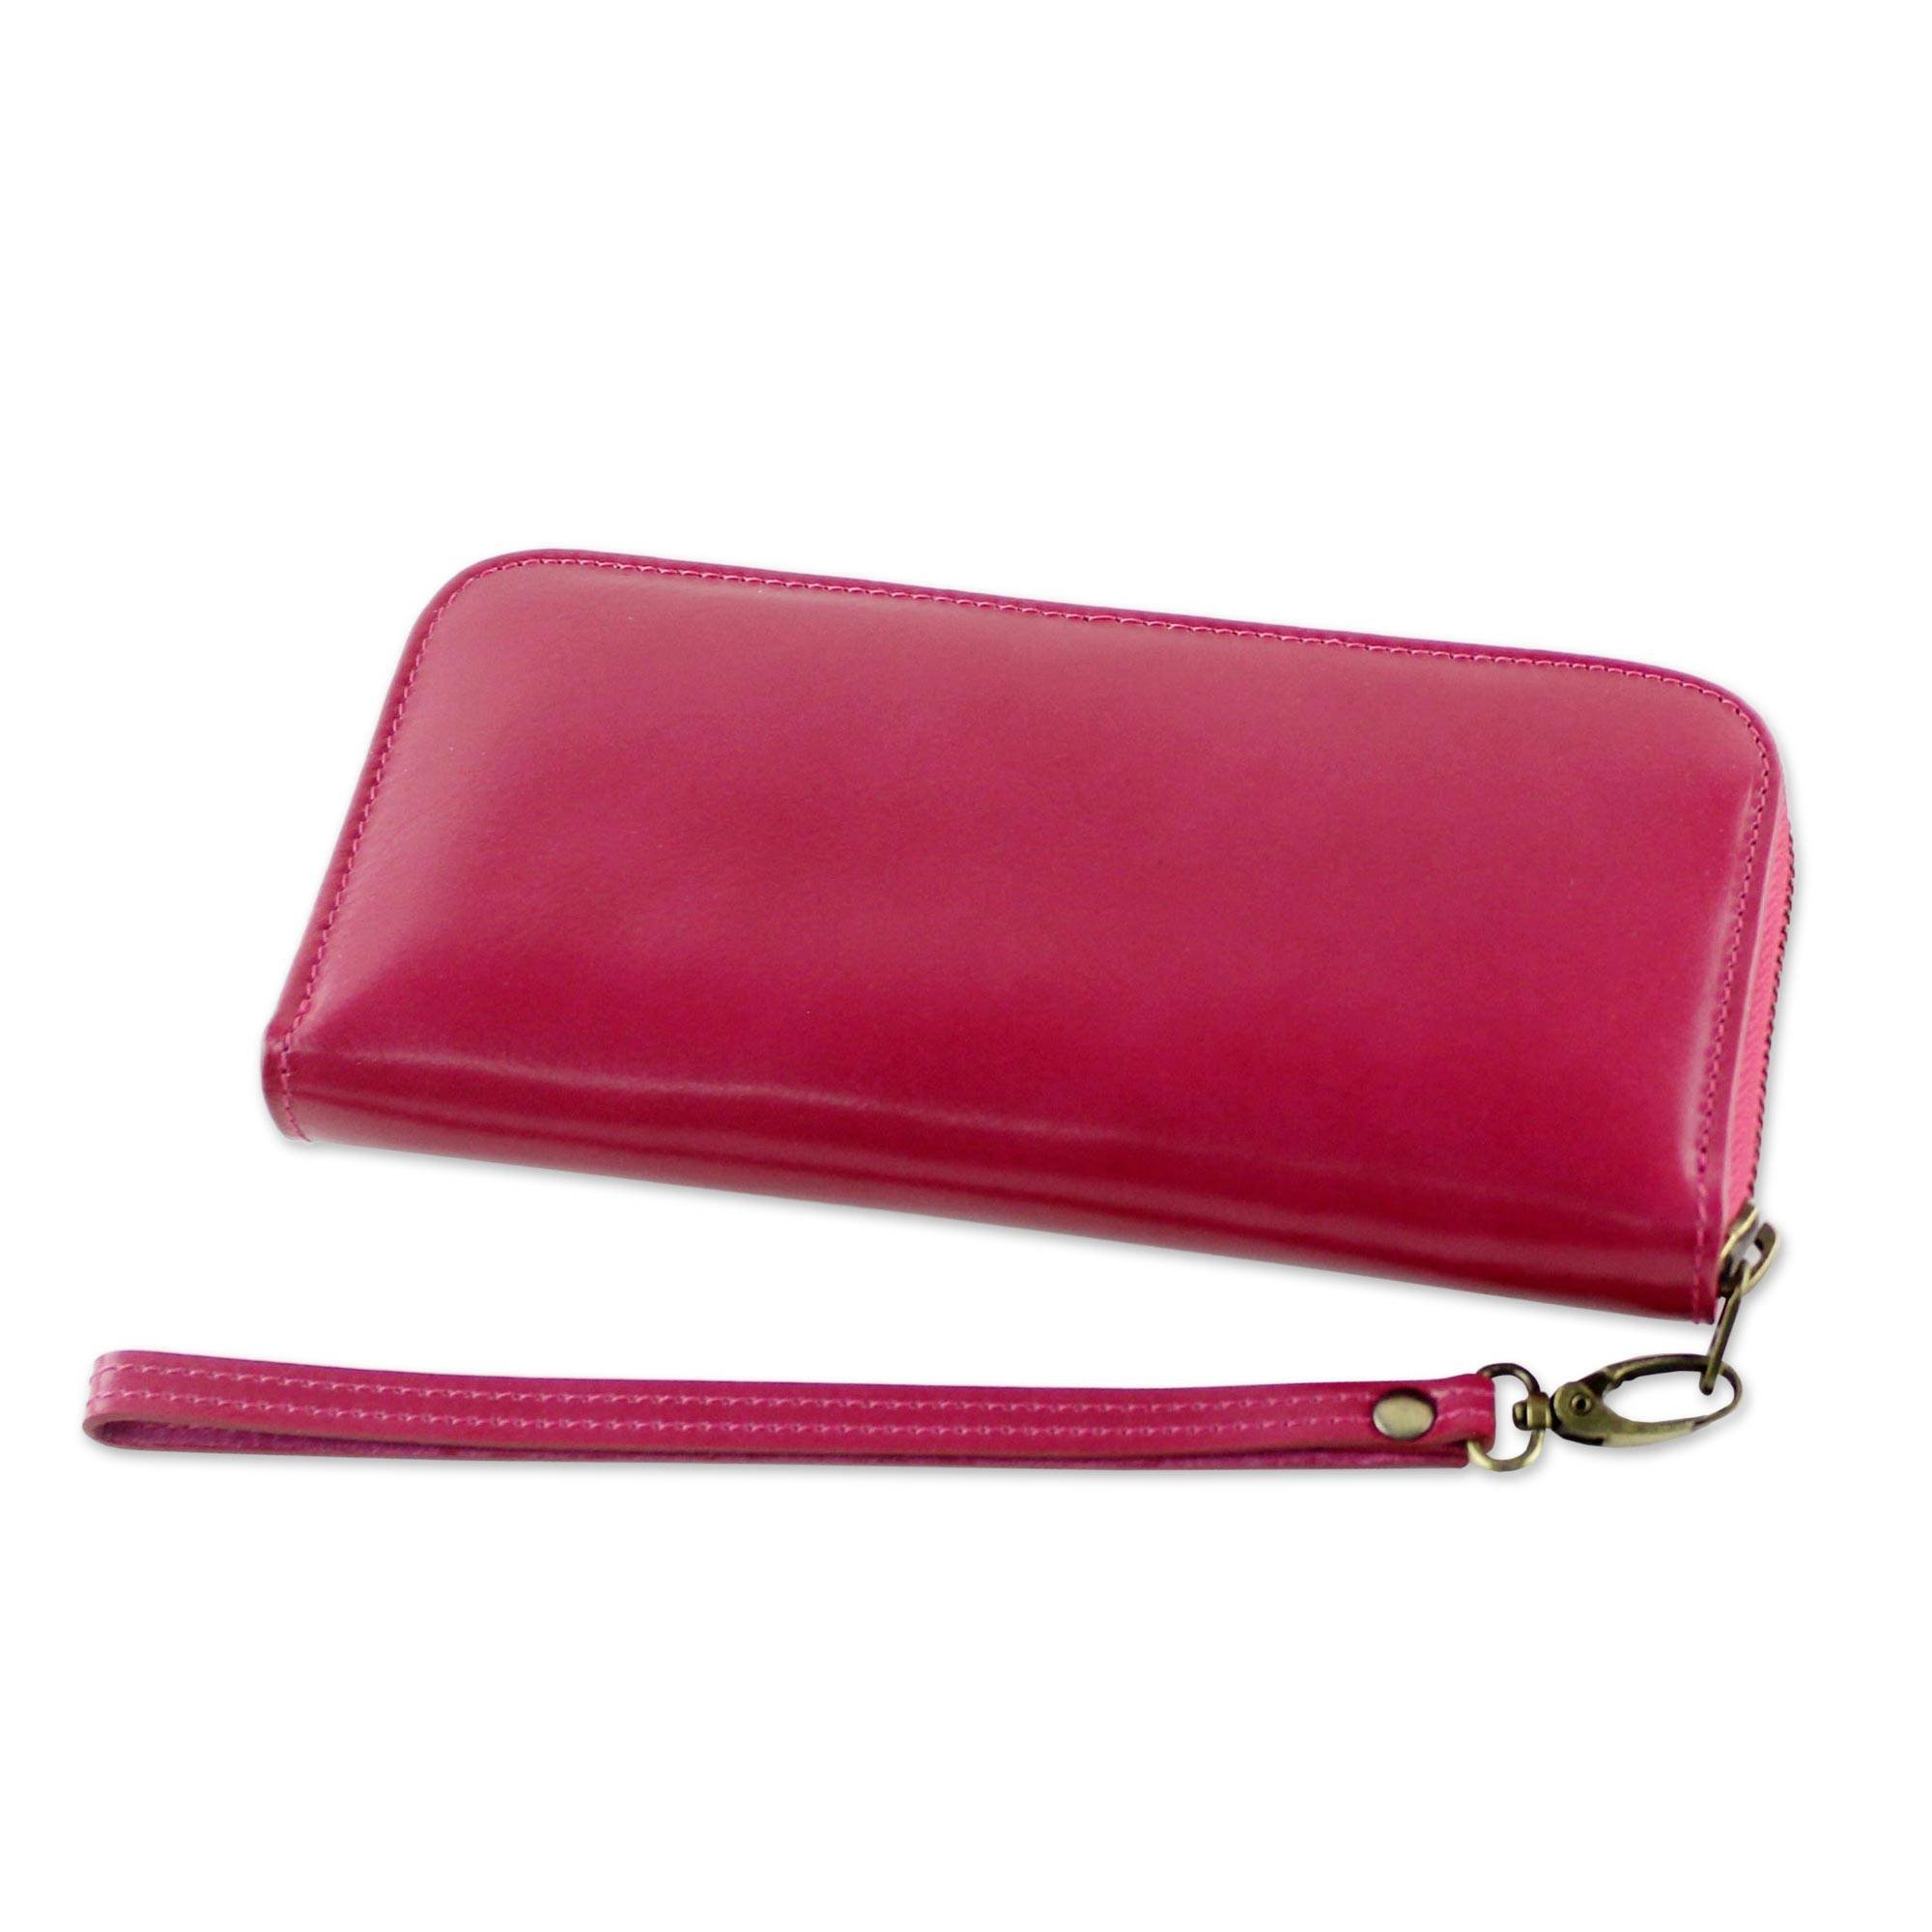 NOVICA Pink Leather Wristlet, 'Cerise Love'